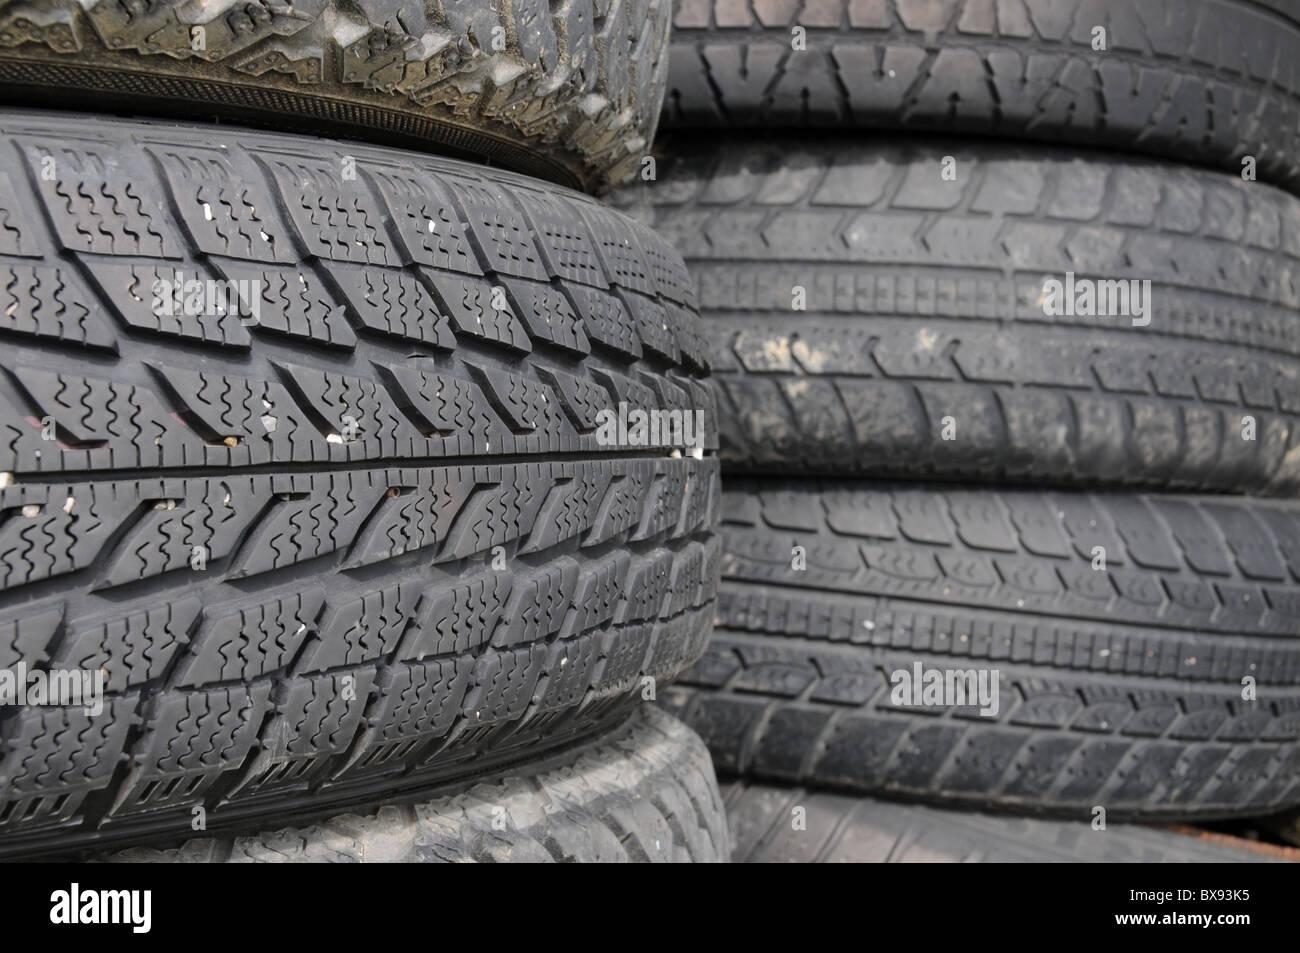 Scrap tire storage Stock Photo